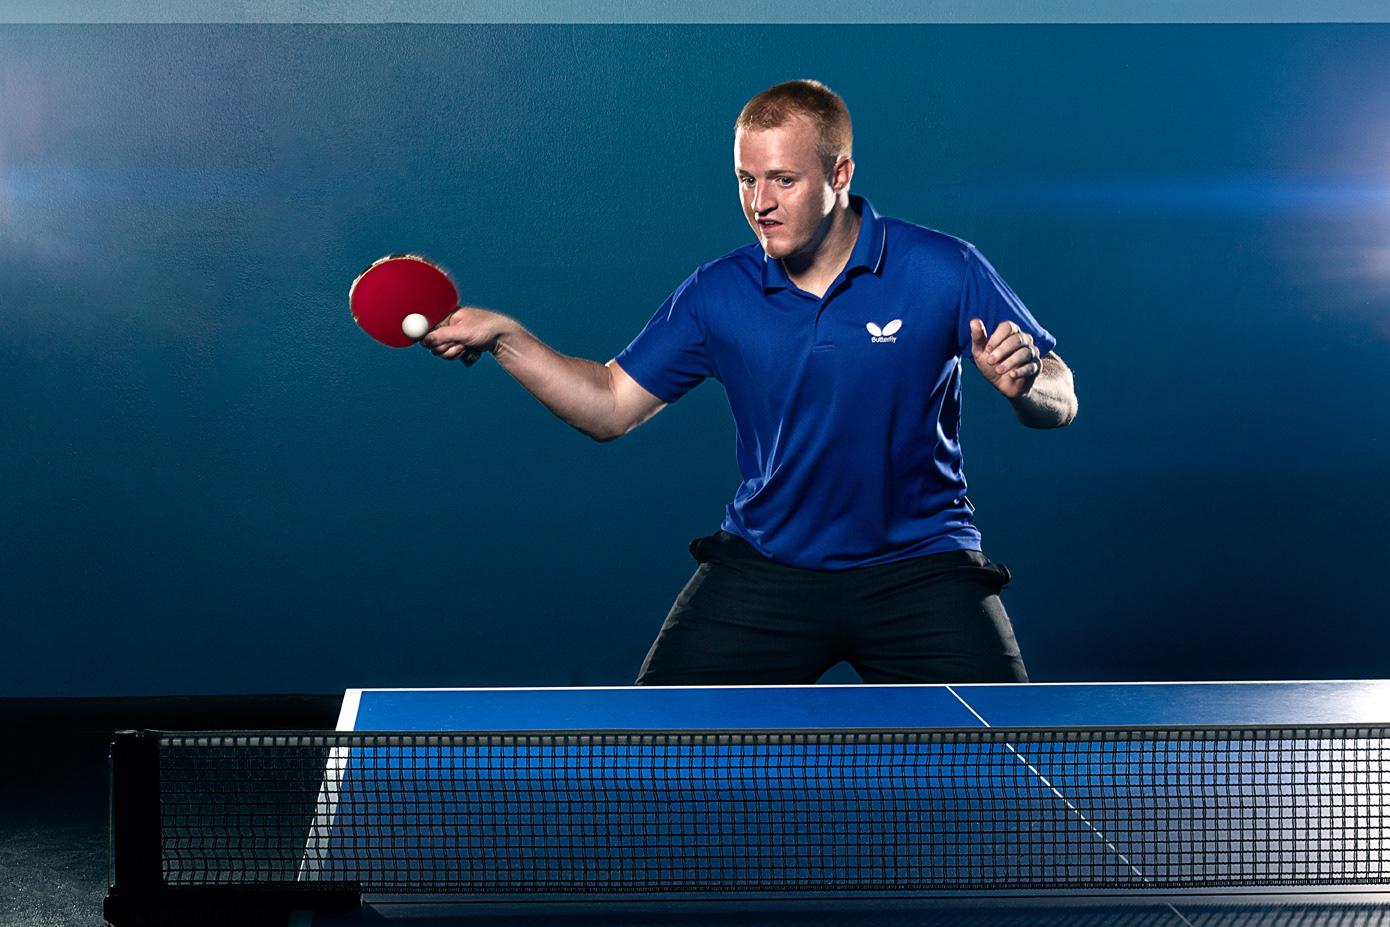 Braxton Wilhelmsen Table Tennis Photos For Utah Table Tennis - Training table salt lake city